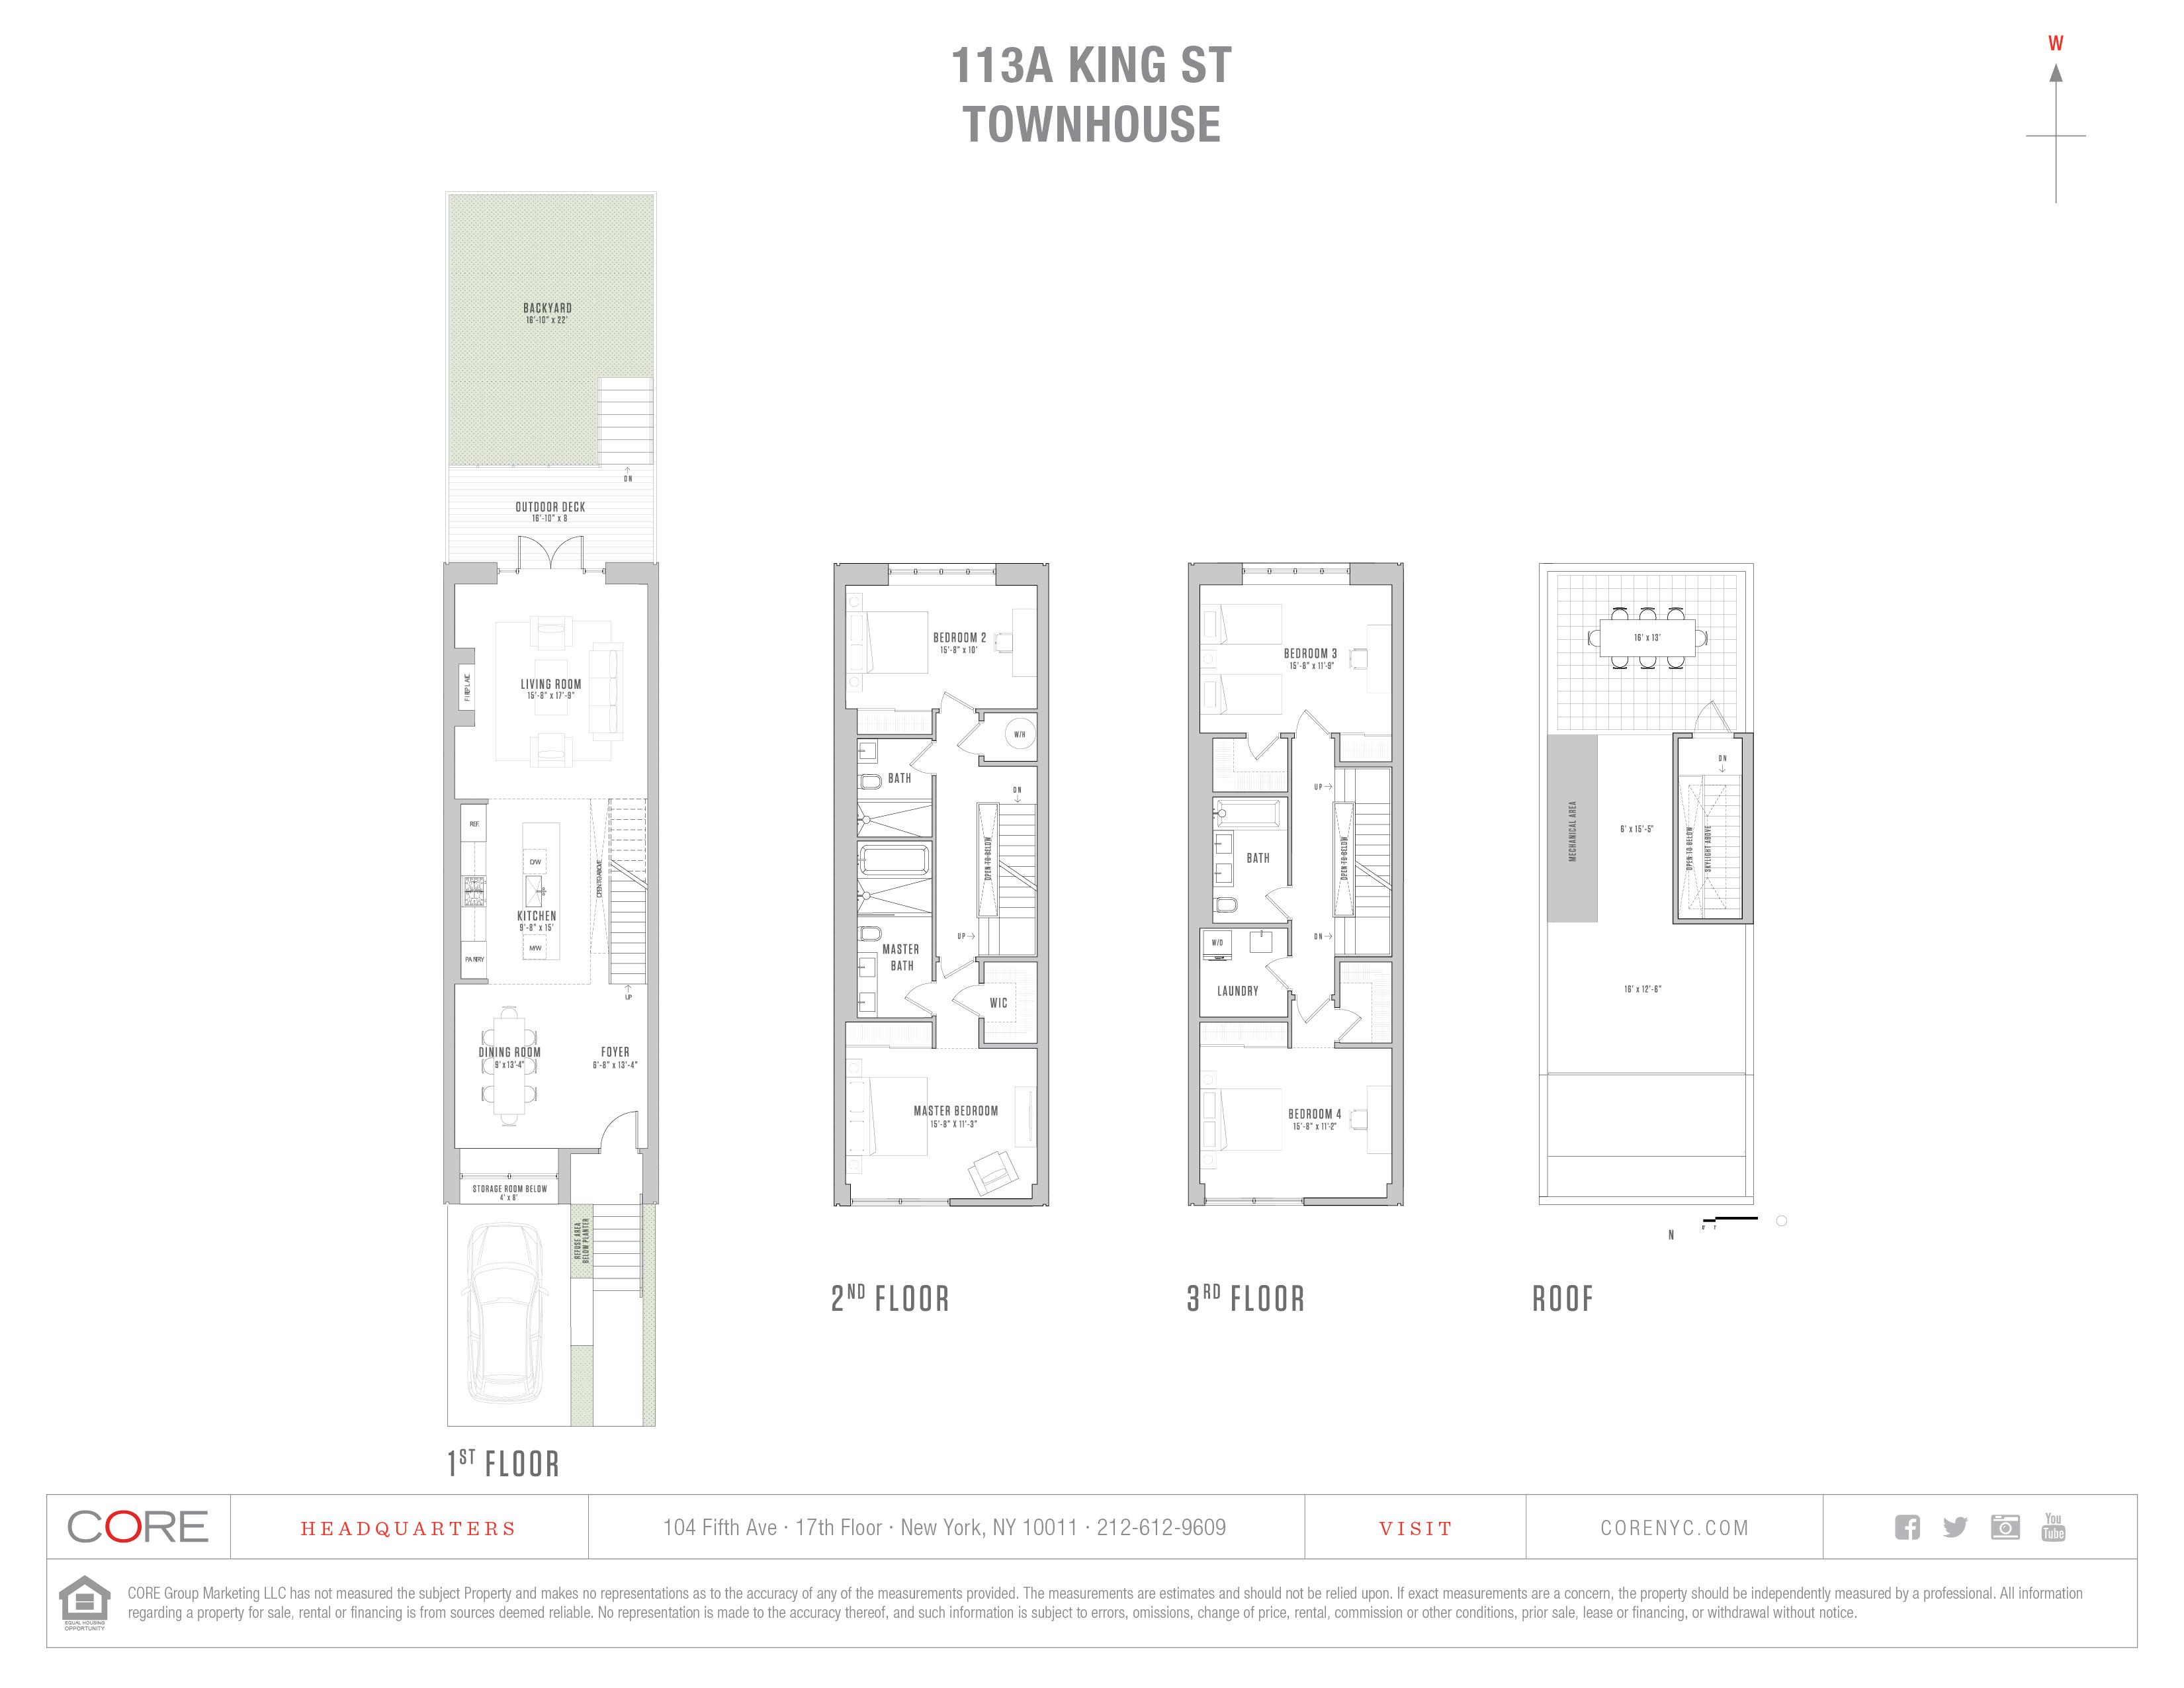 113a King St TOWNHOUSE, Brooklyn, NY 11231